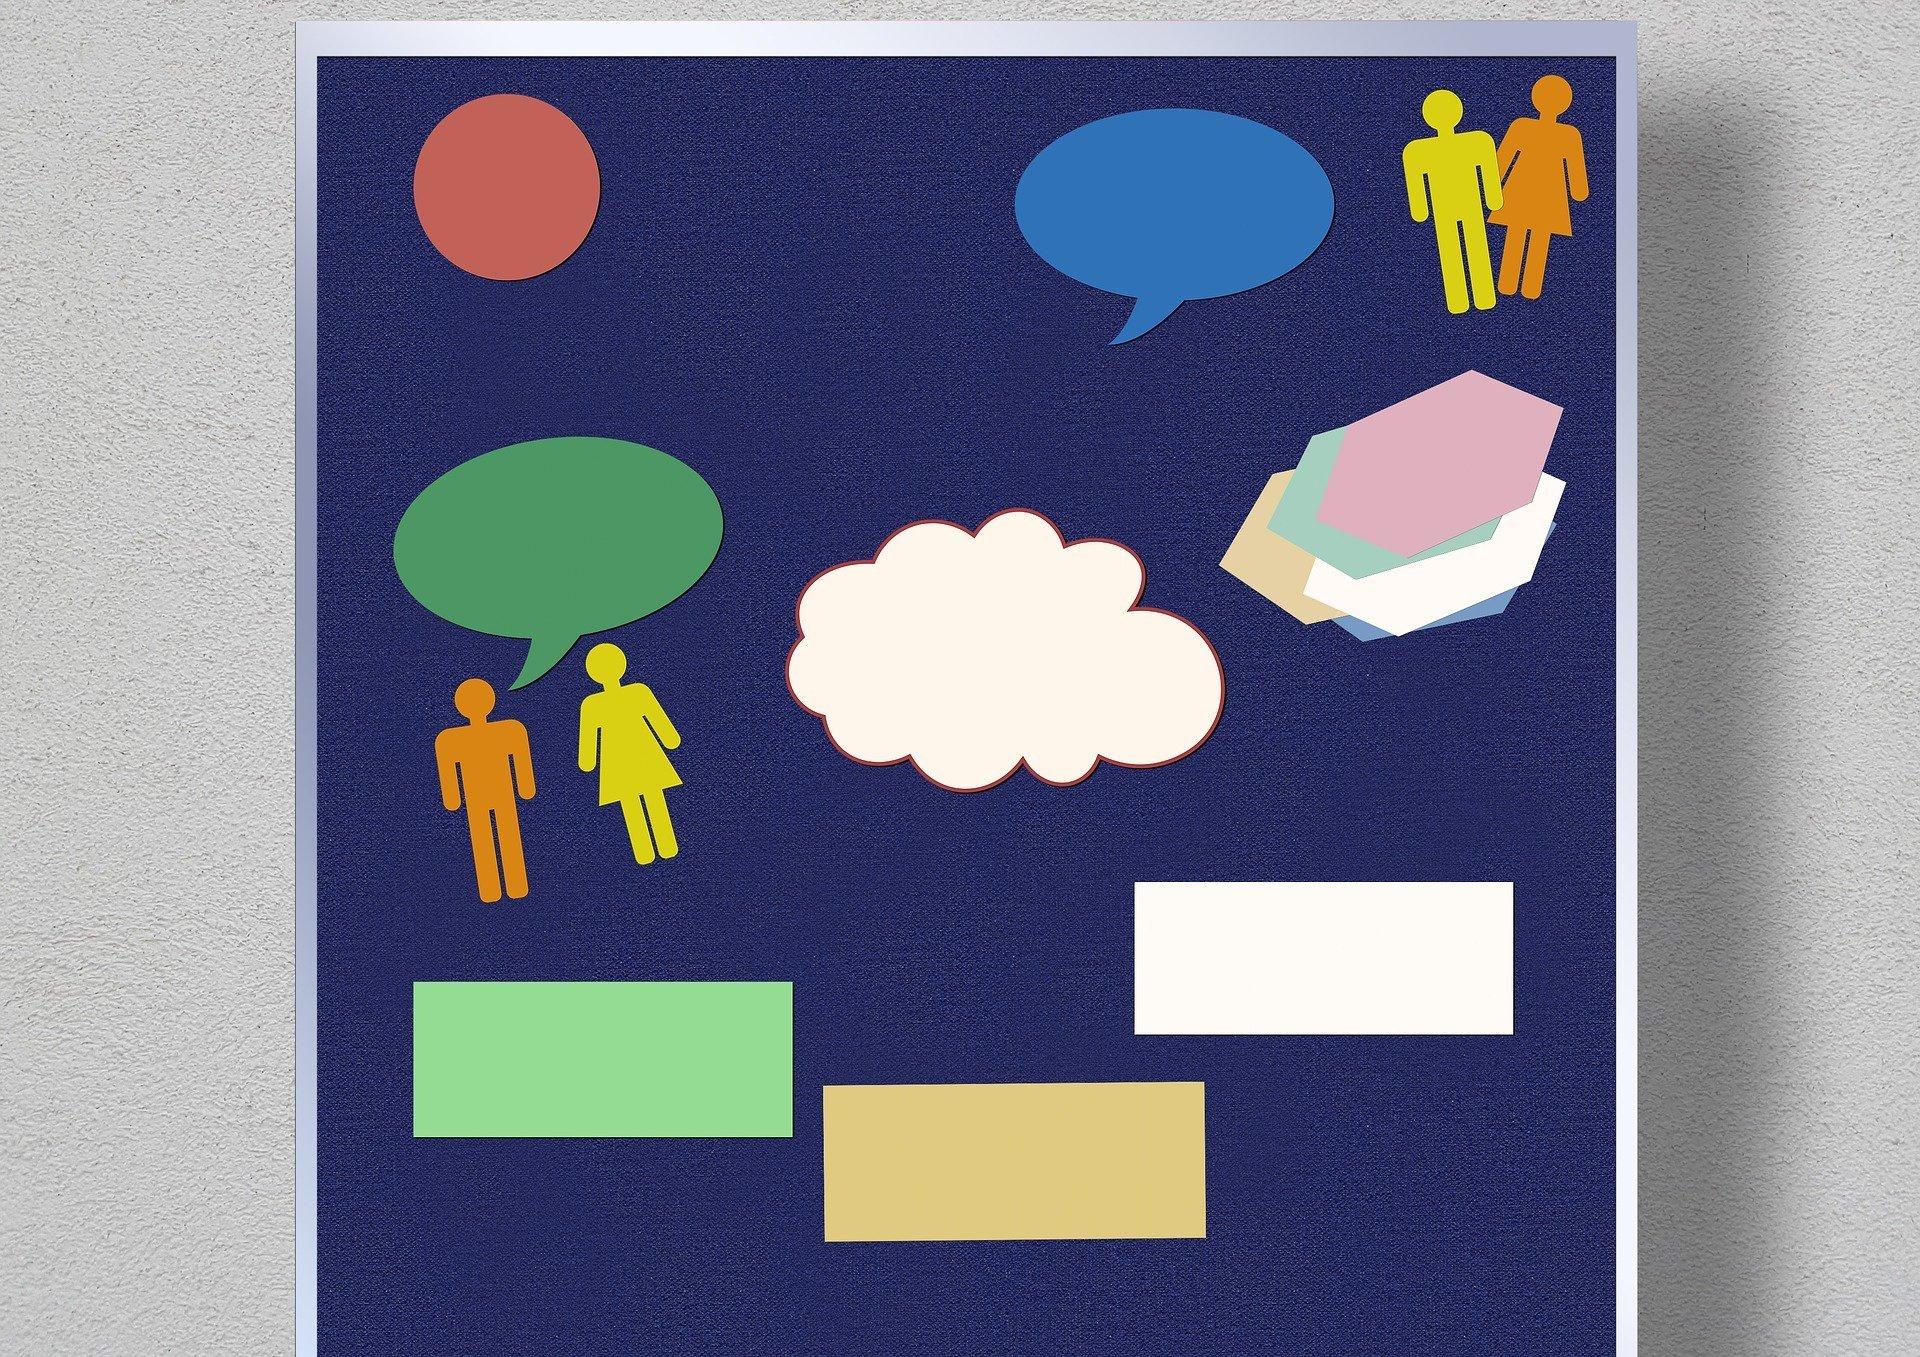 Pinnwand mit leeren Moderationskarten